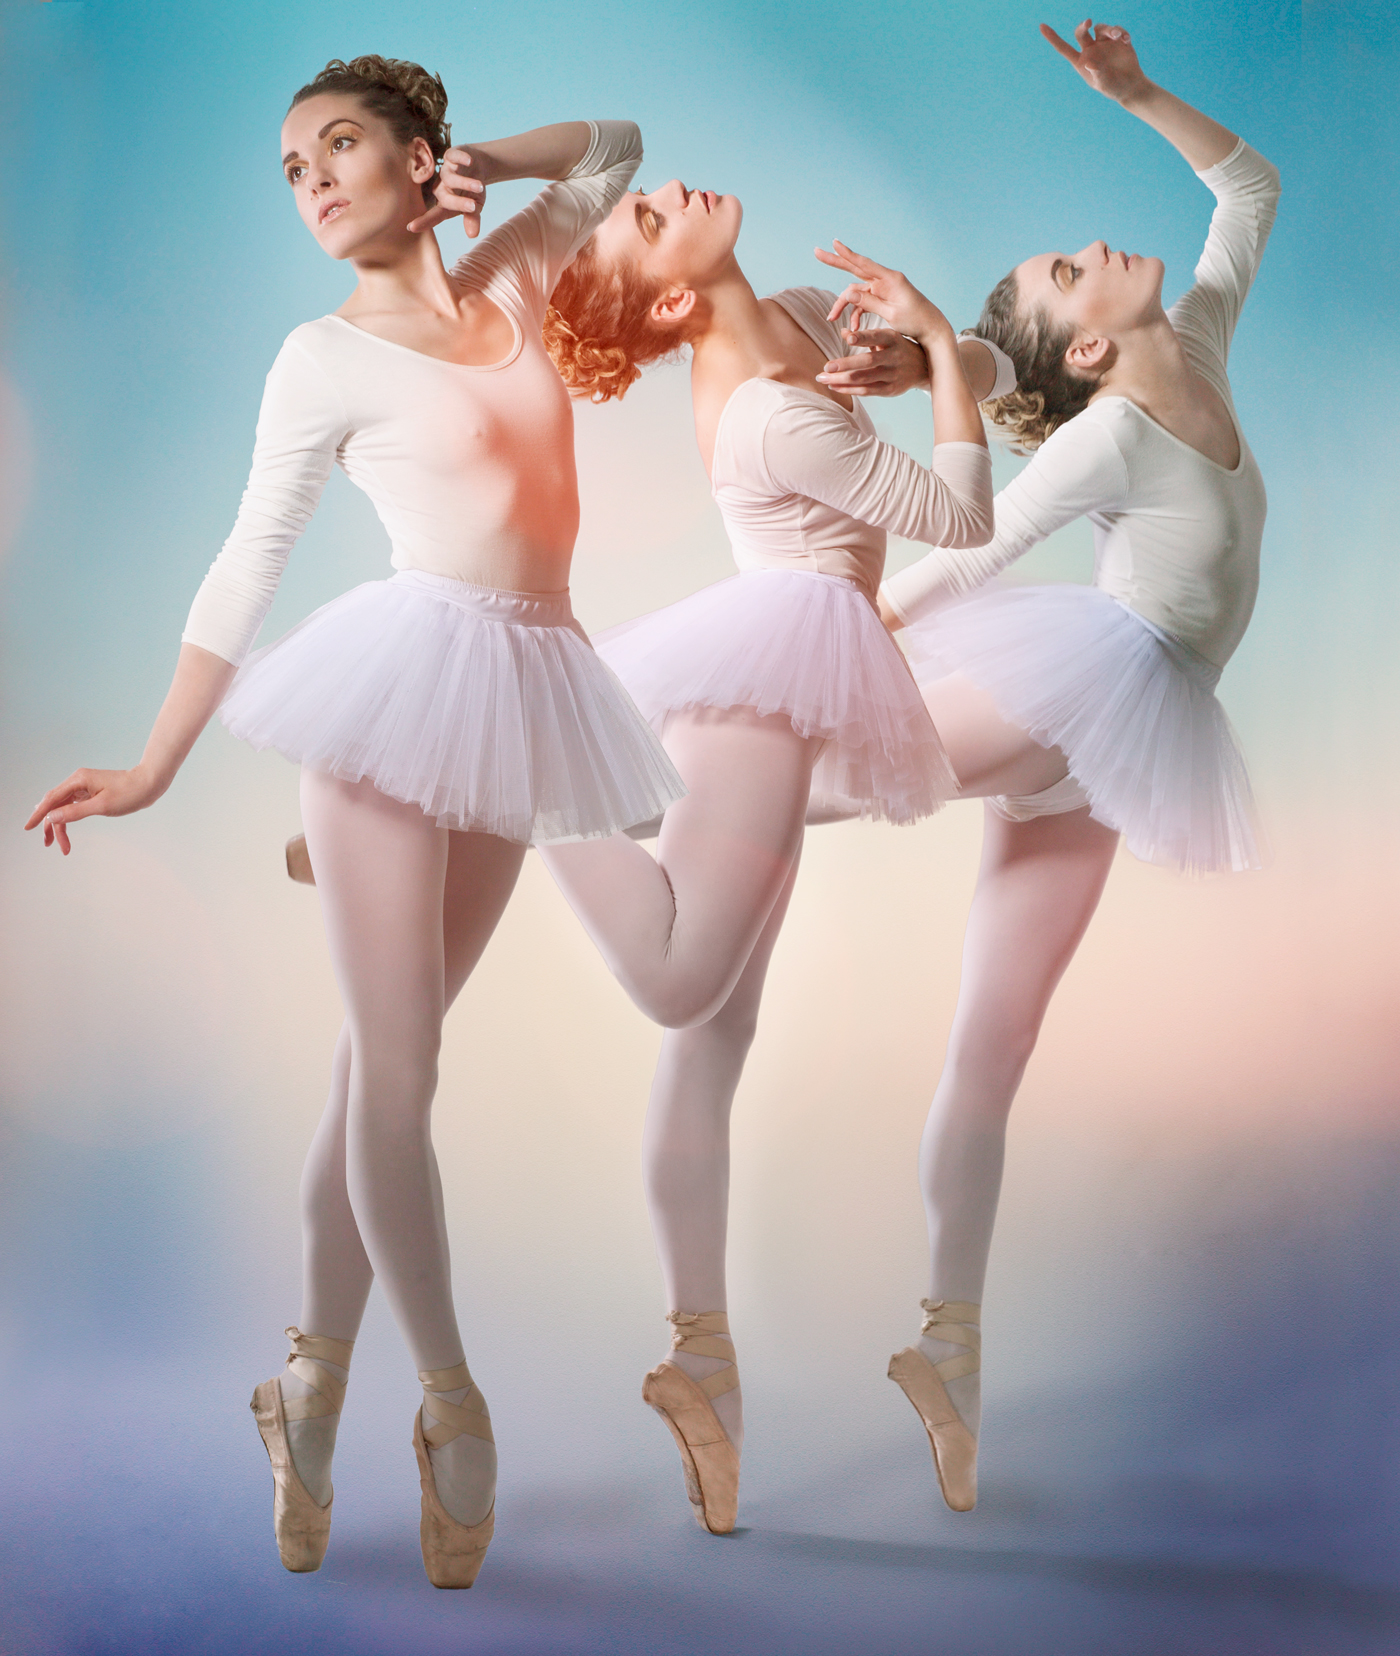 https://gordonscott.photography/wp-content/uploads/2018/07/Ballerinas-2.jpg